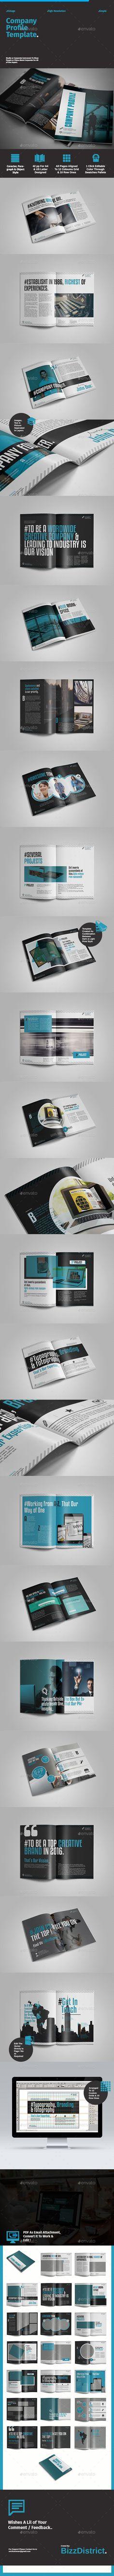 Company Profile Brandbook Template #design Download: http://graphicriver.net/item/company-profile-template/11405889?ref=ksioks